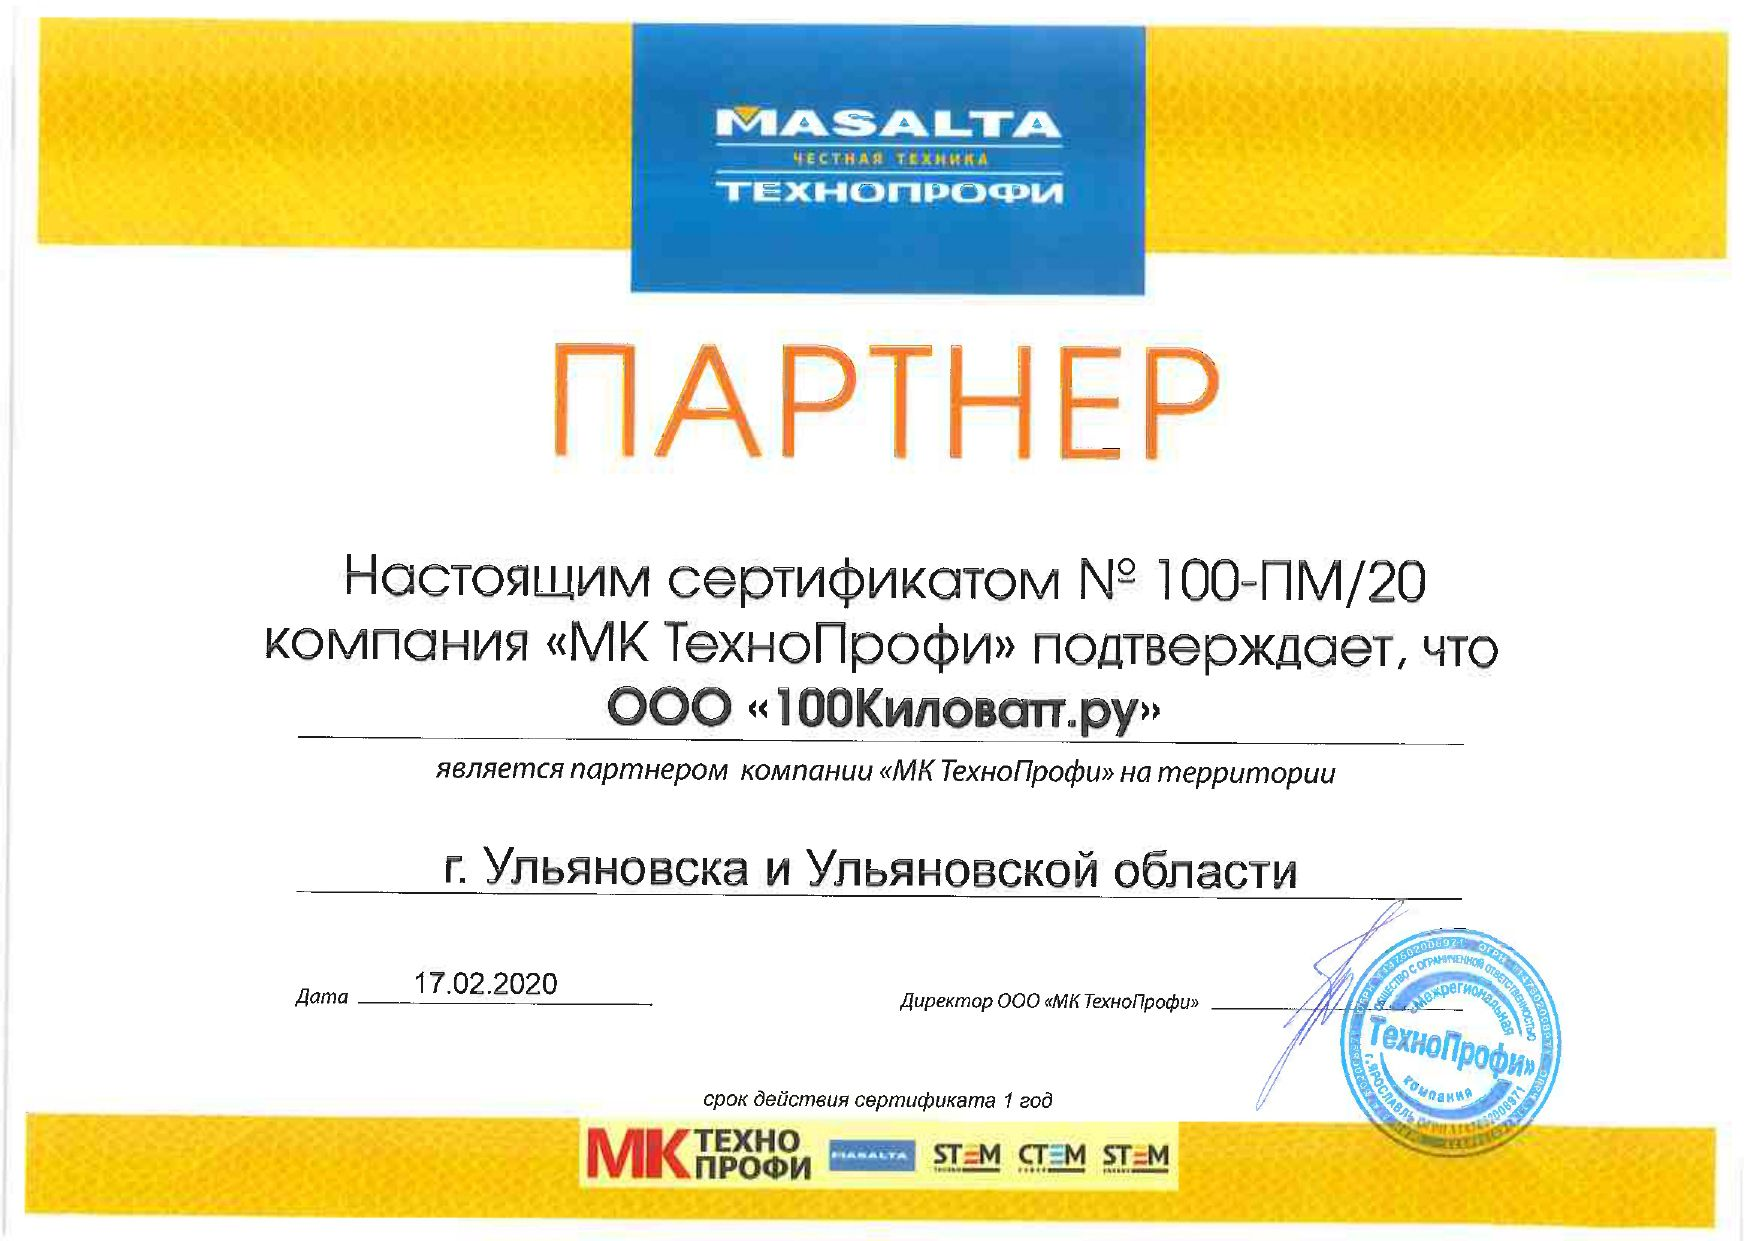 MASALTA - Сертификат дилера